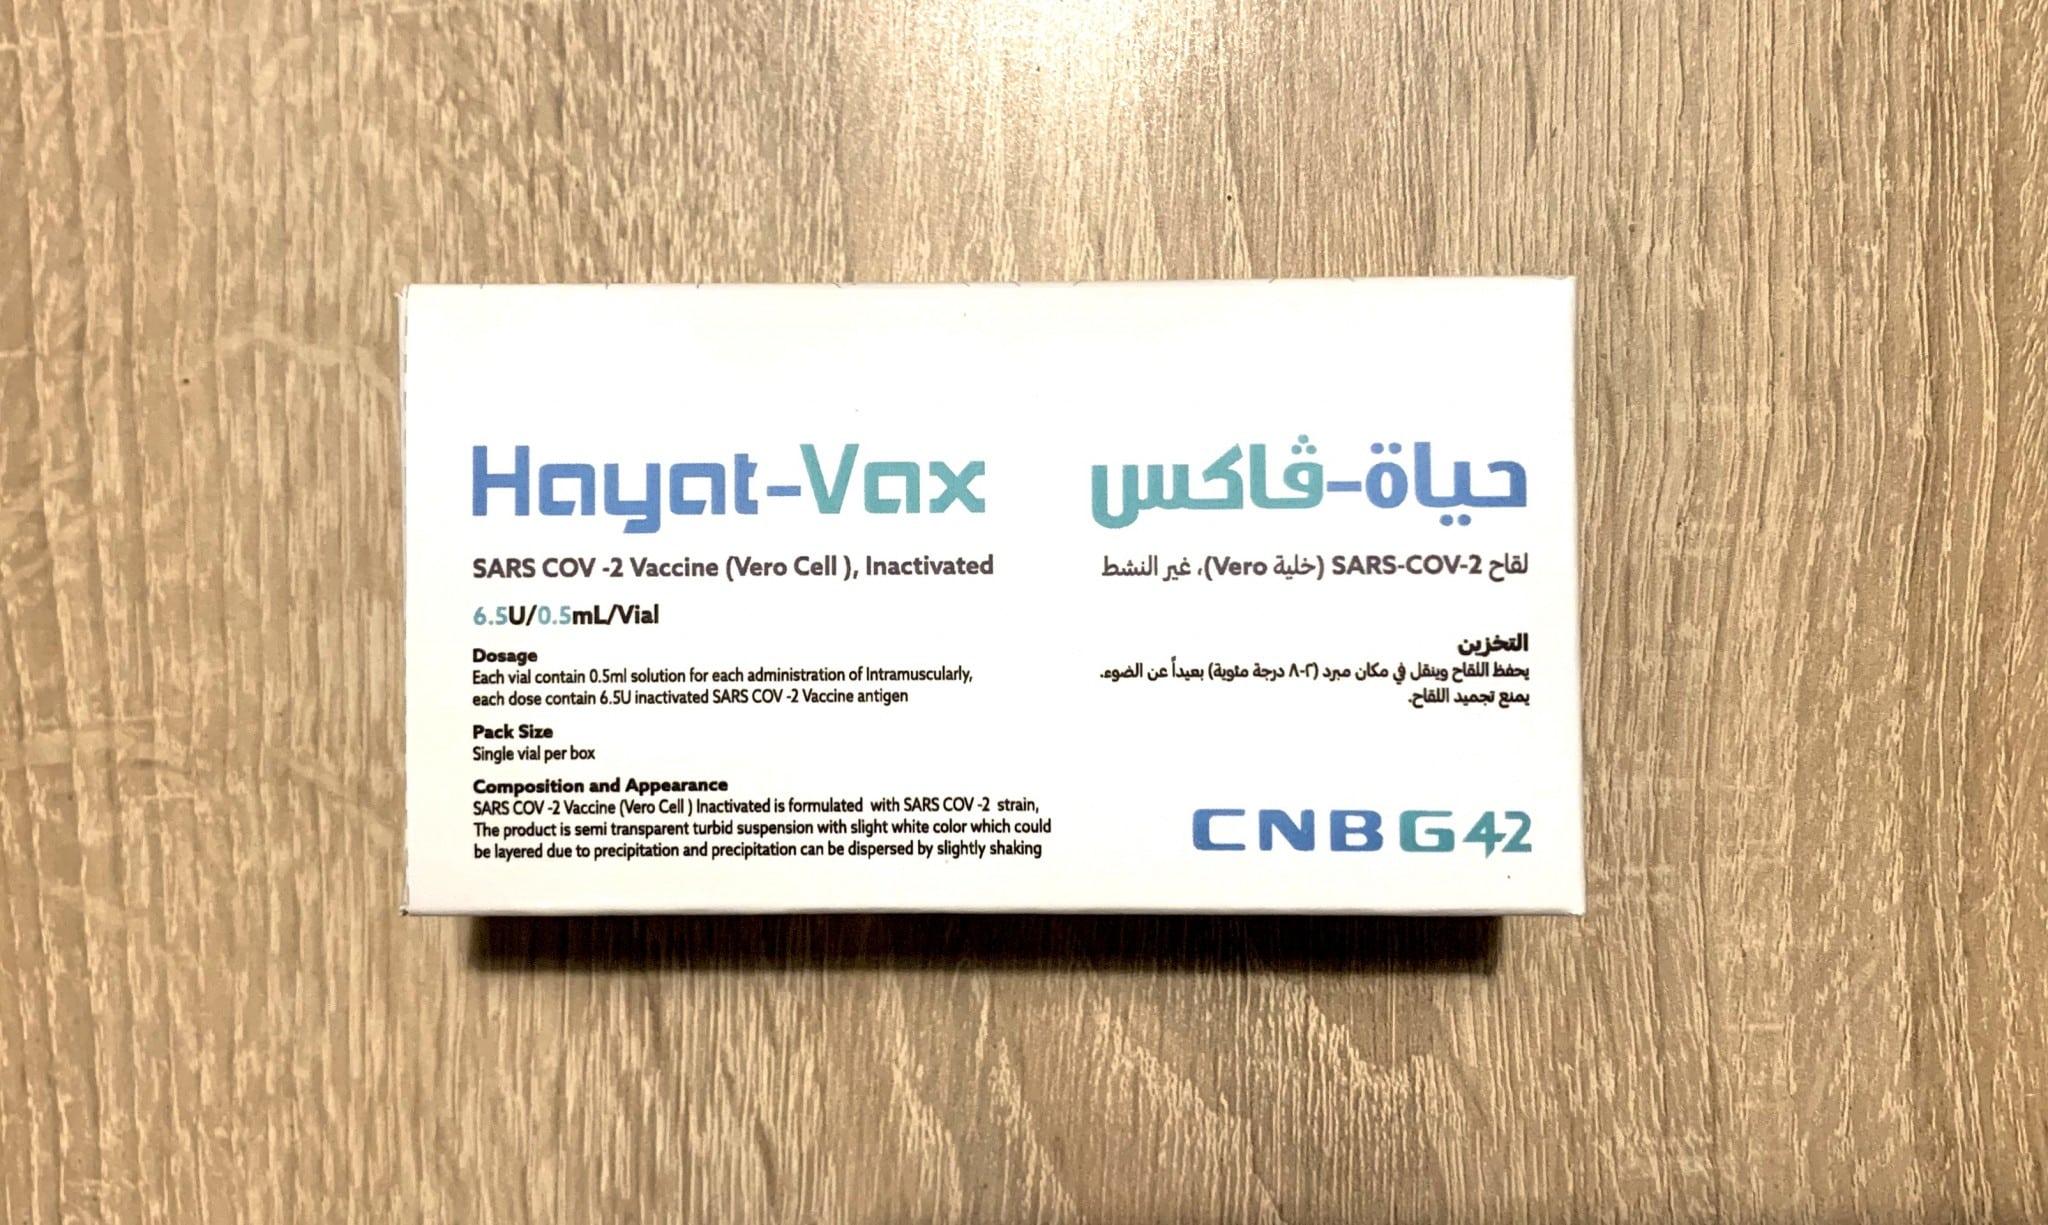 Коронавирус, вакцина, Hayat-Vax